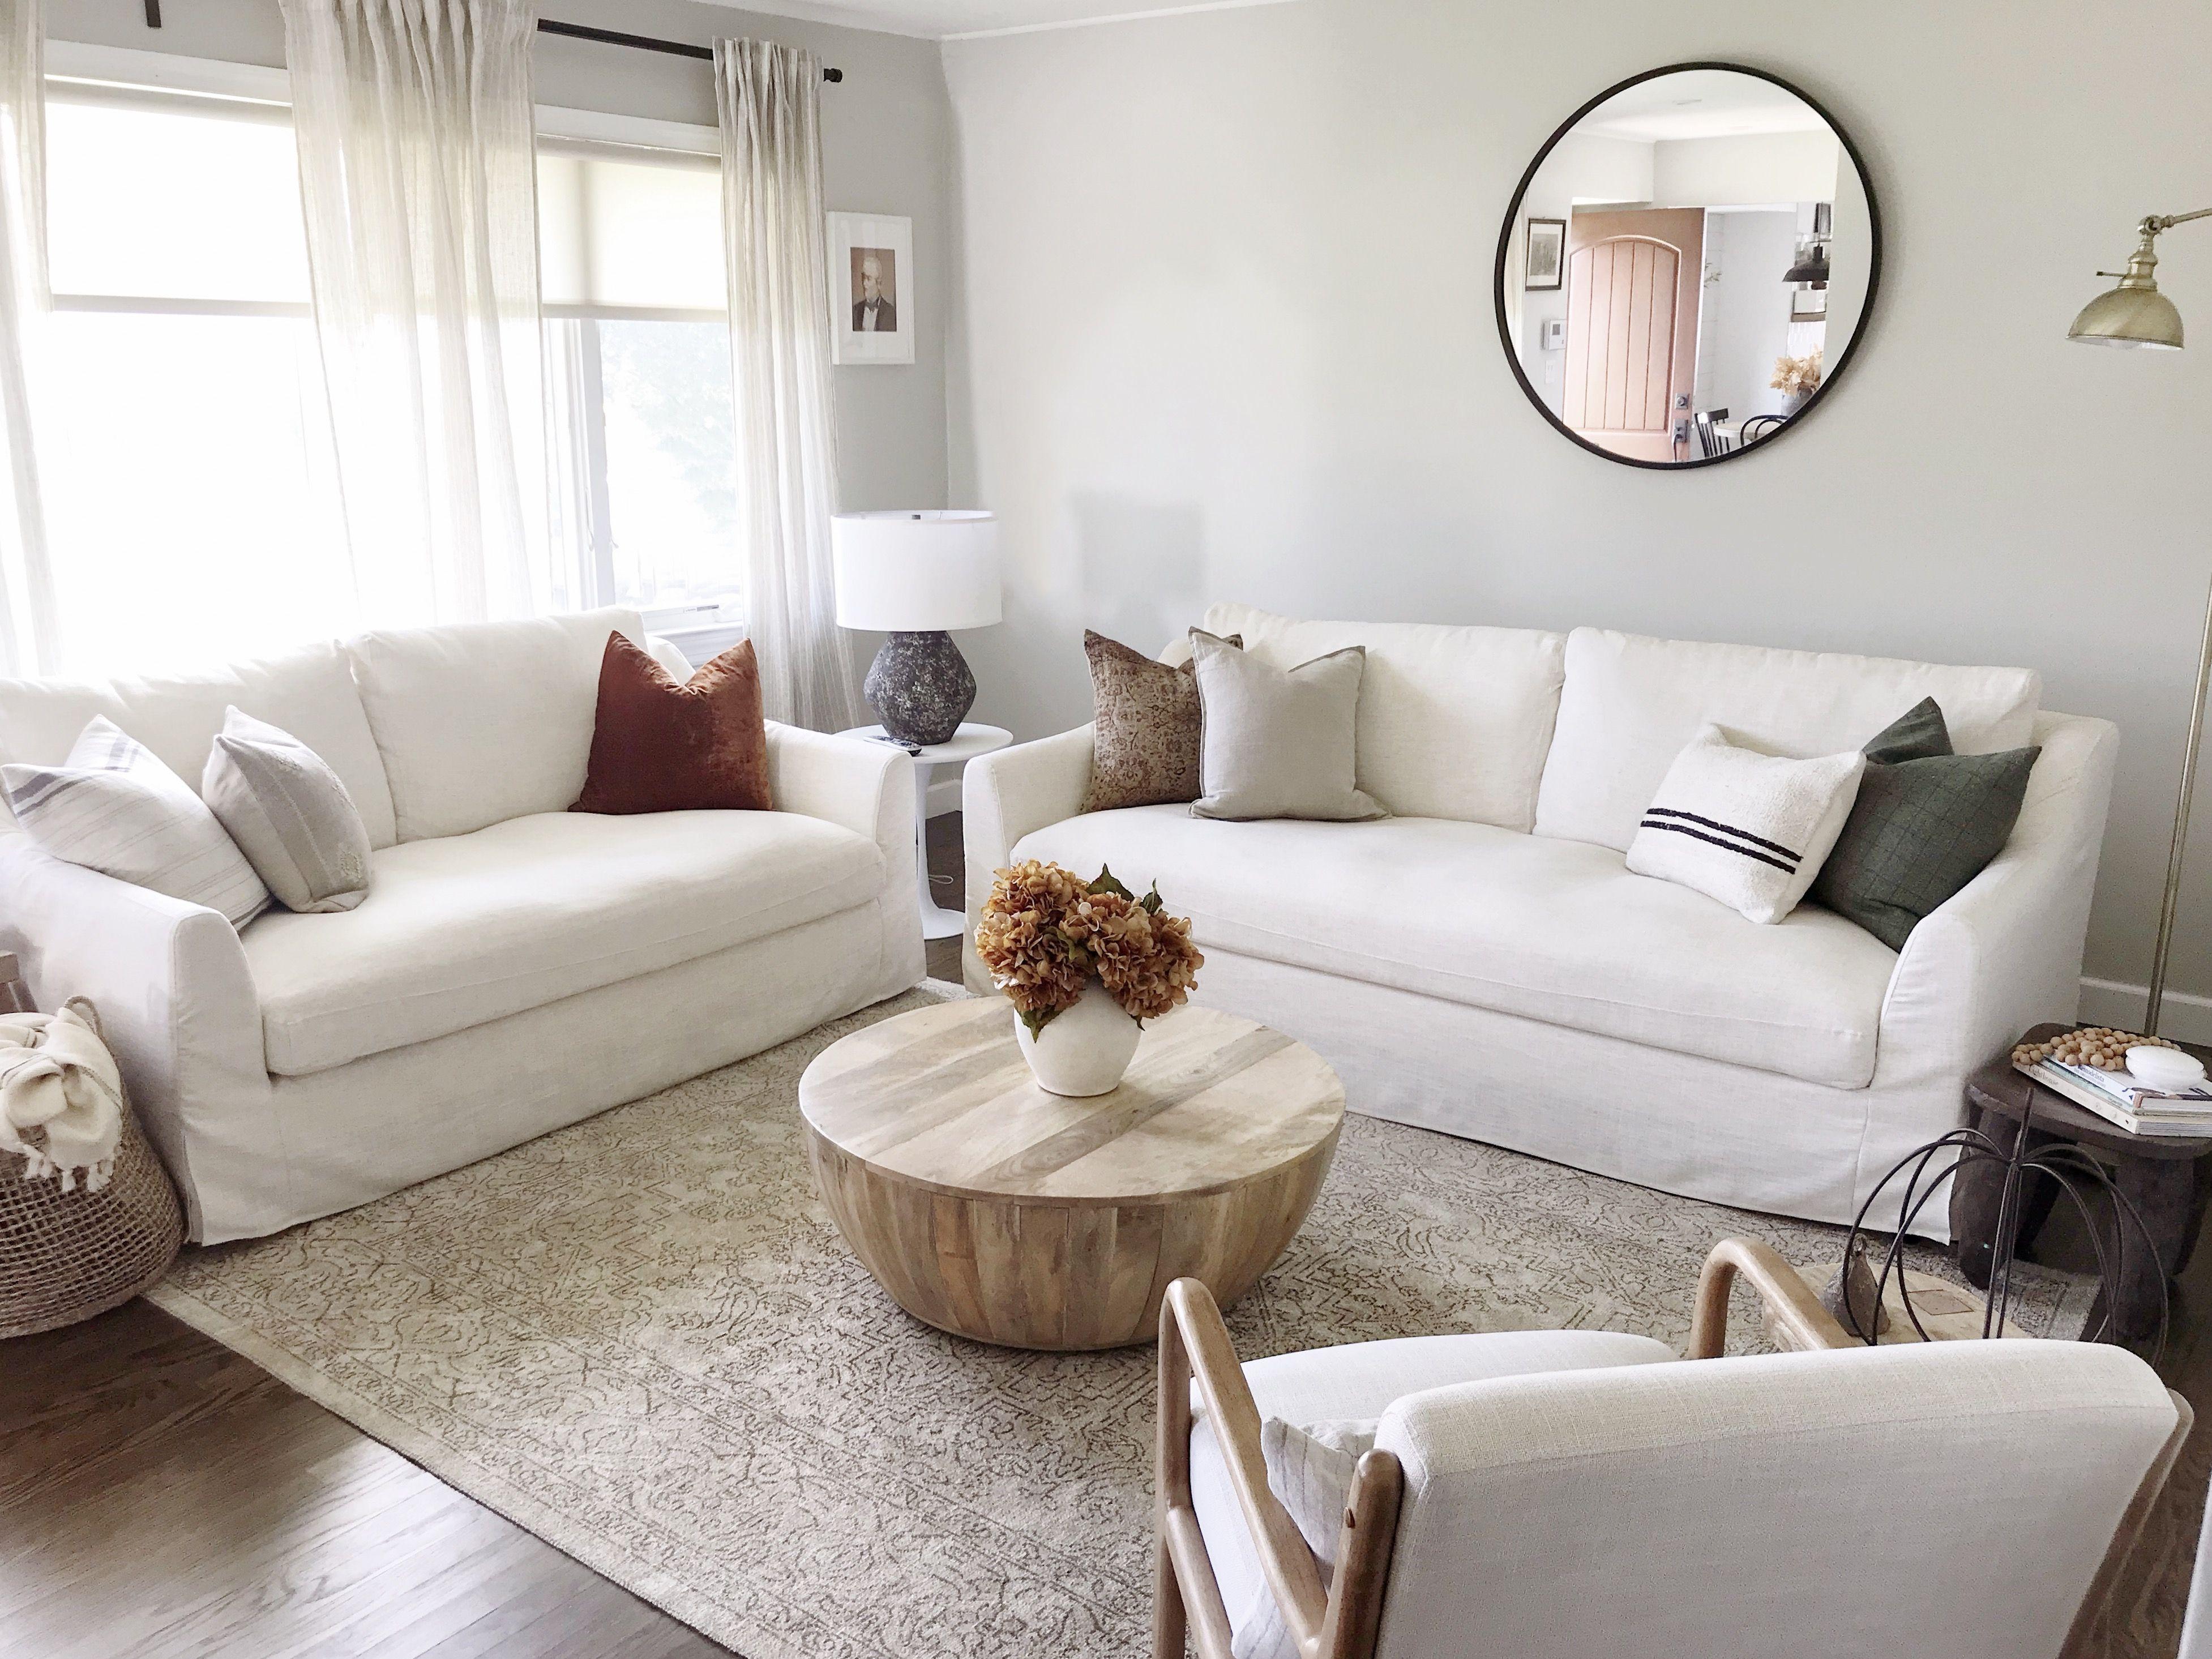 Ikea Farlov 2 Seater Sofa Cover In Luna Flax Linen Fabric Ikea Living Room Living Room White Living Room Sofa